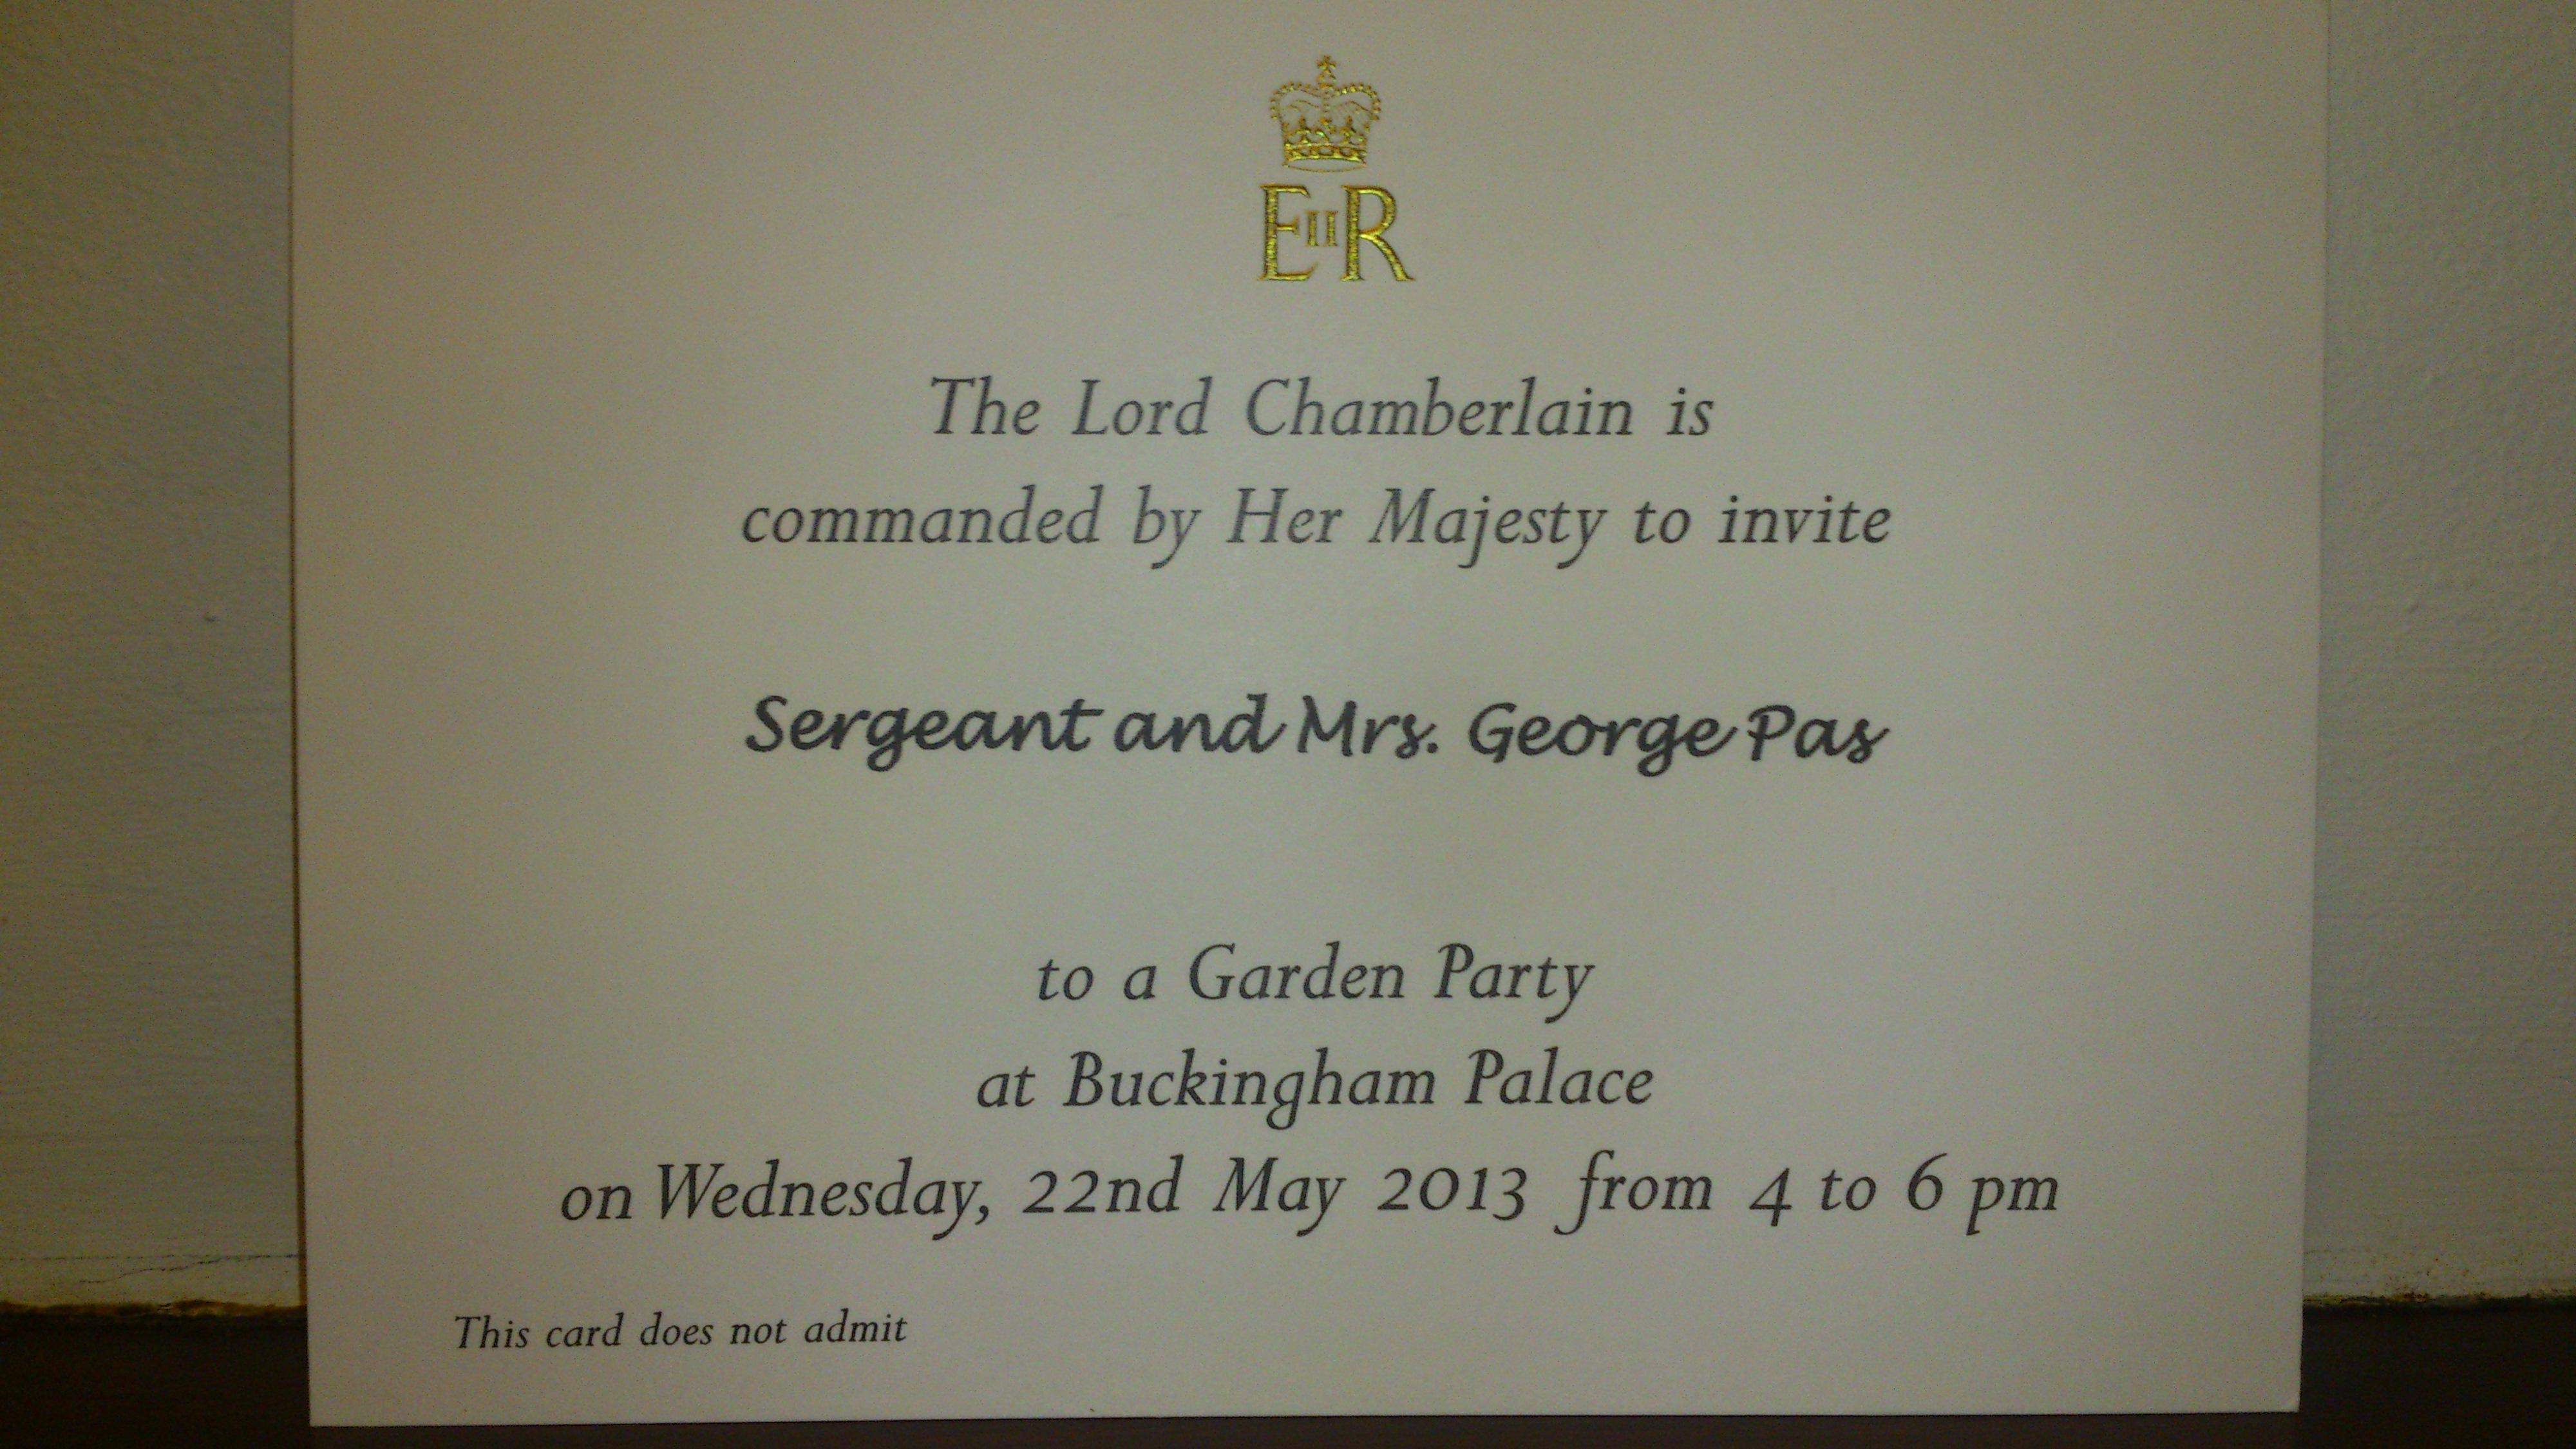 Blank Invitation Cards as good invitation ideas